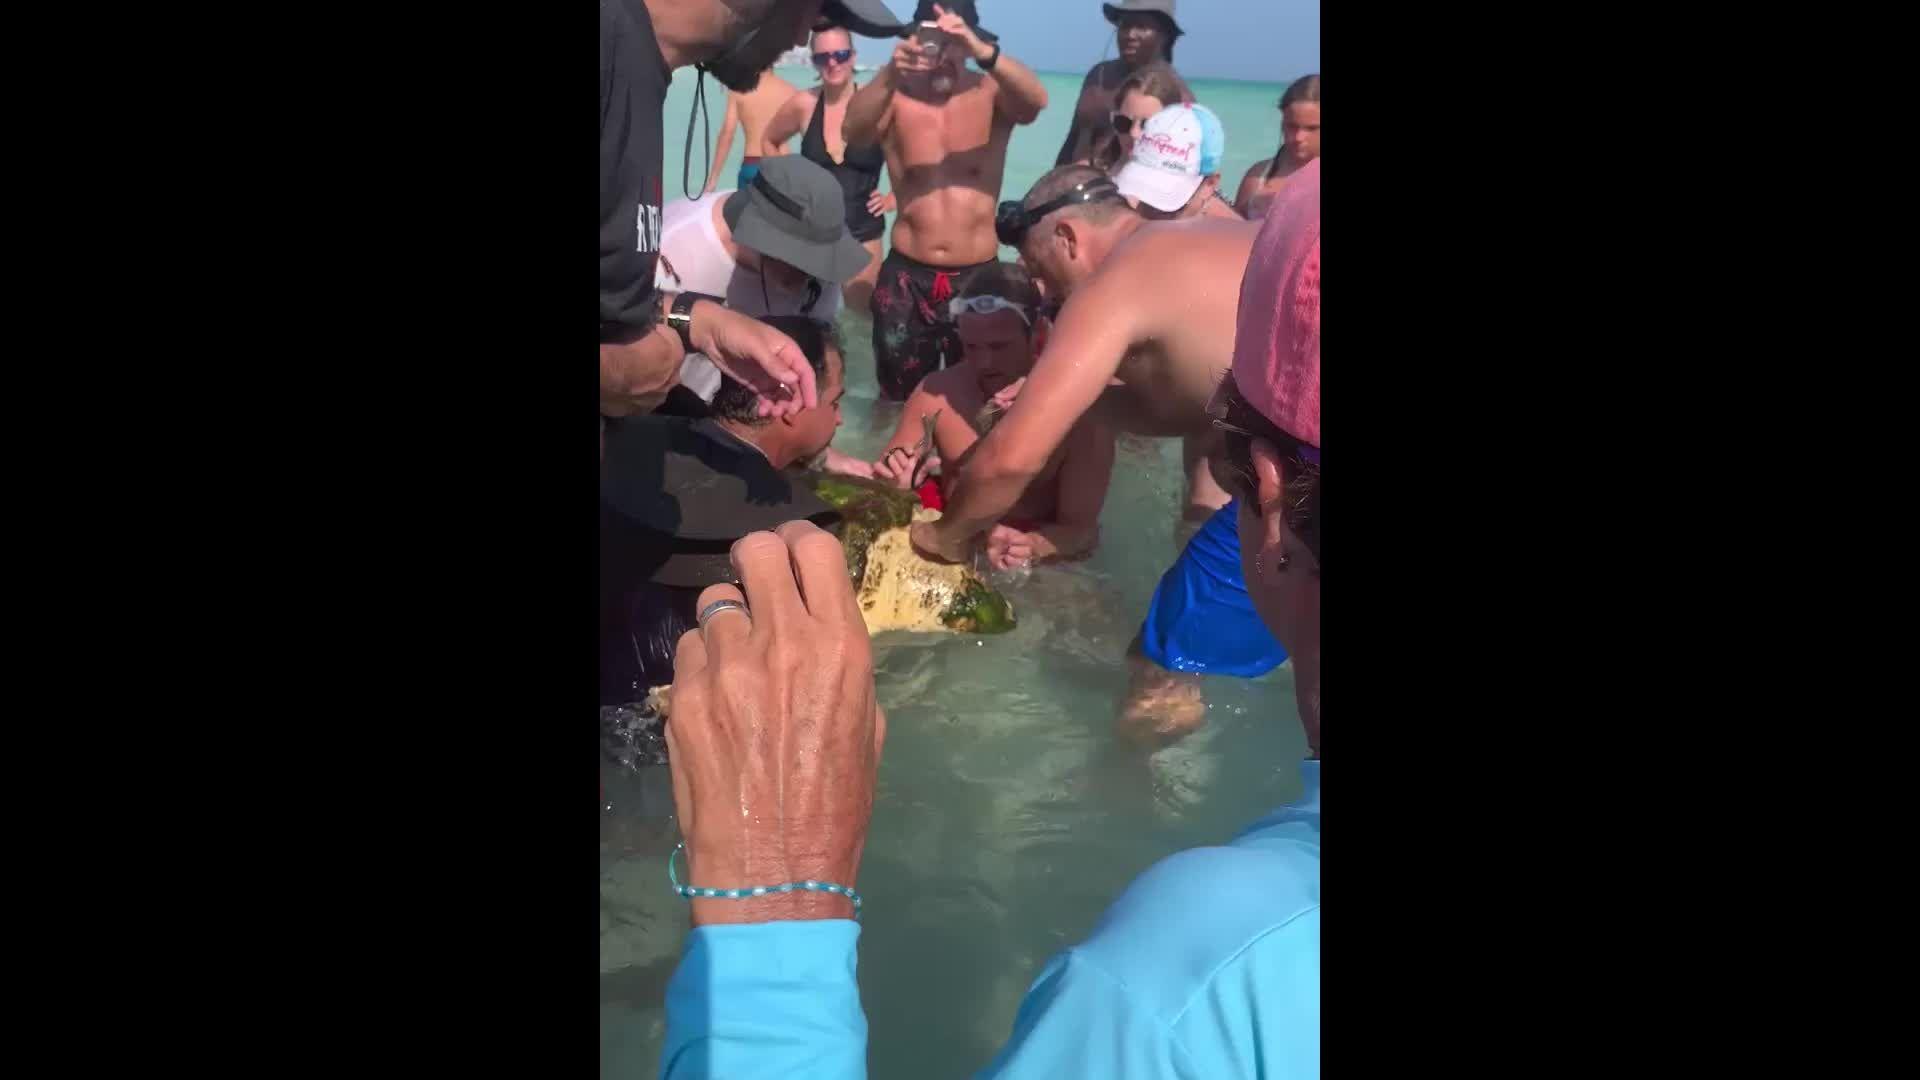 Florida lifeguard saves sea turtle tangled in entire fishing pole